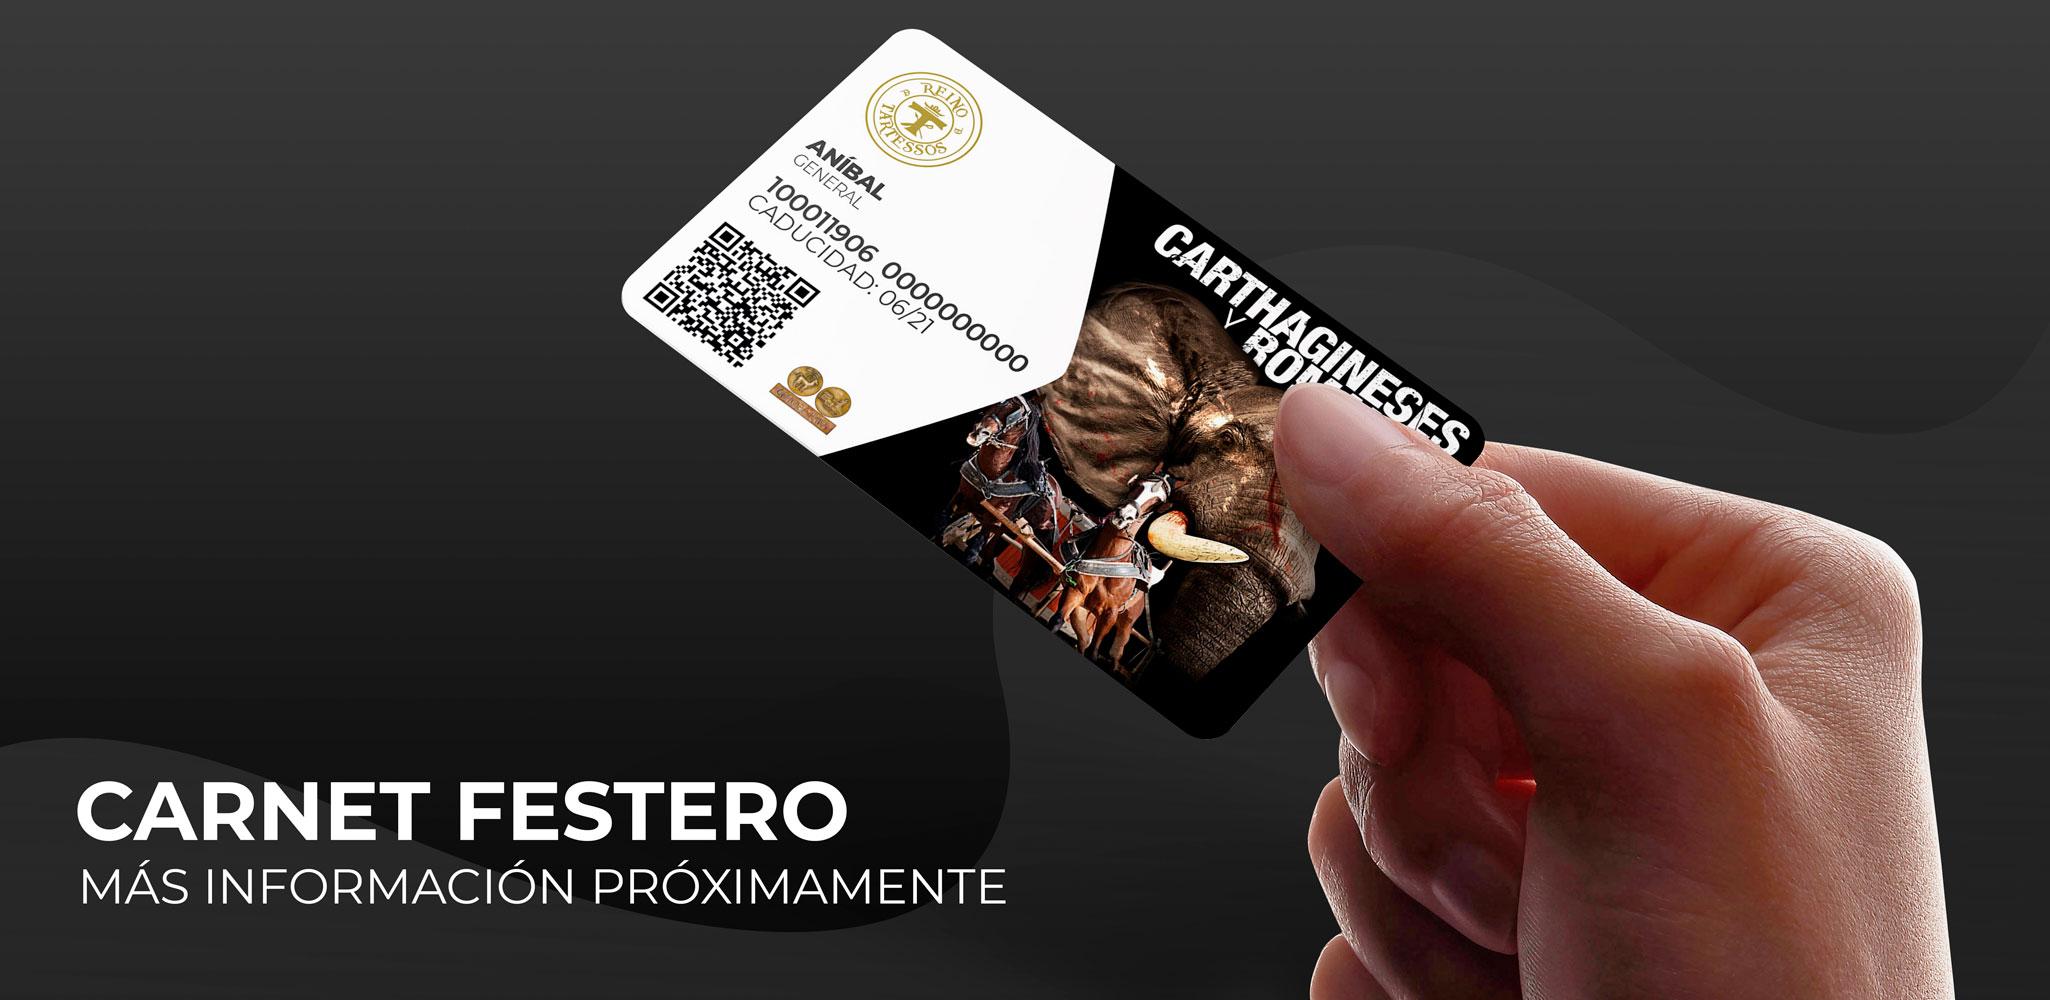 Carnet Festero